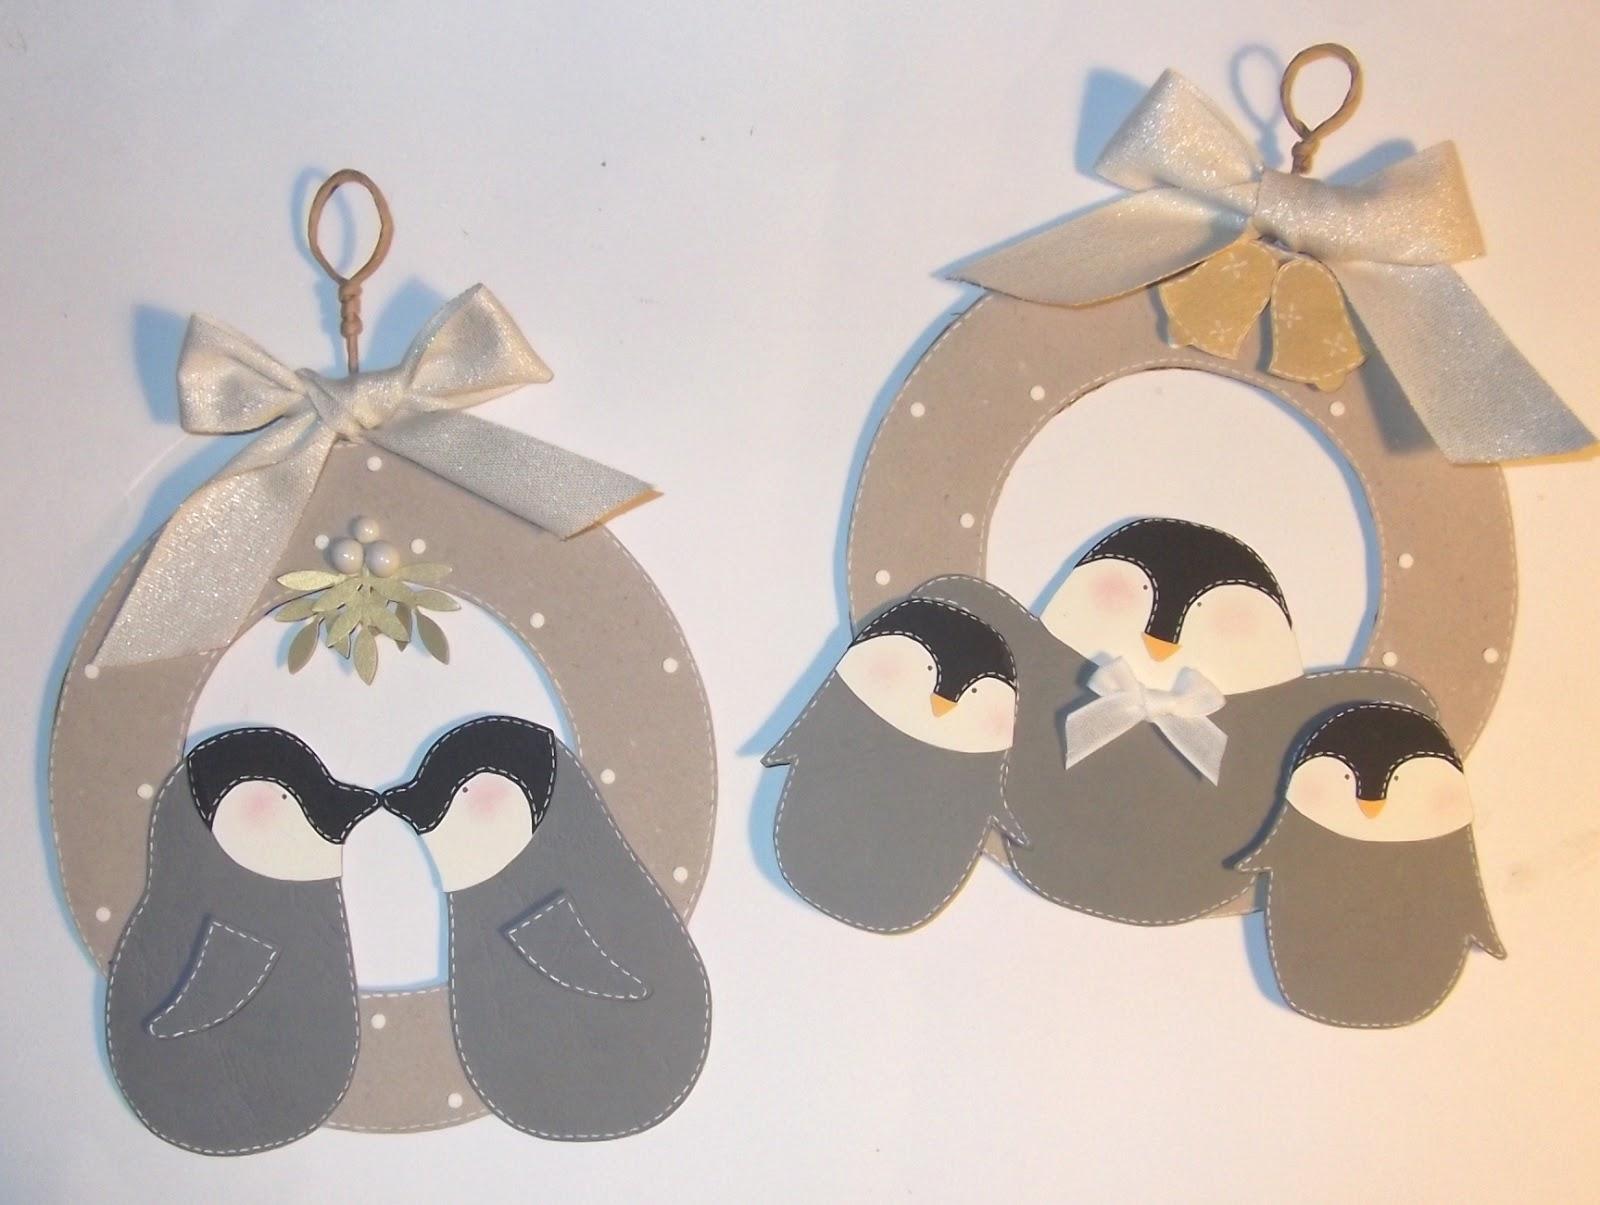 Cartoncino mio ghirlanda in cartone con pinguini